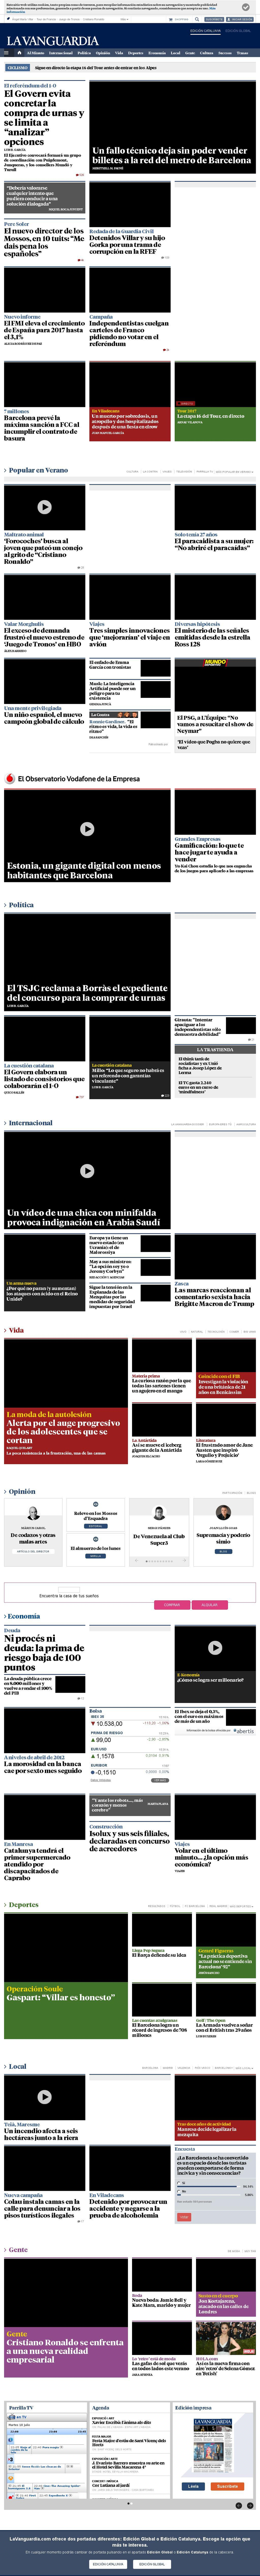 La Vanguardia at Tuesday July 18, 2017, 1:31 p.m. UTC